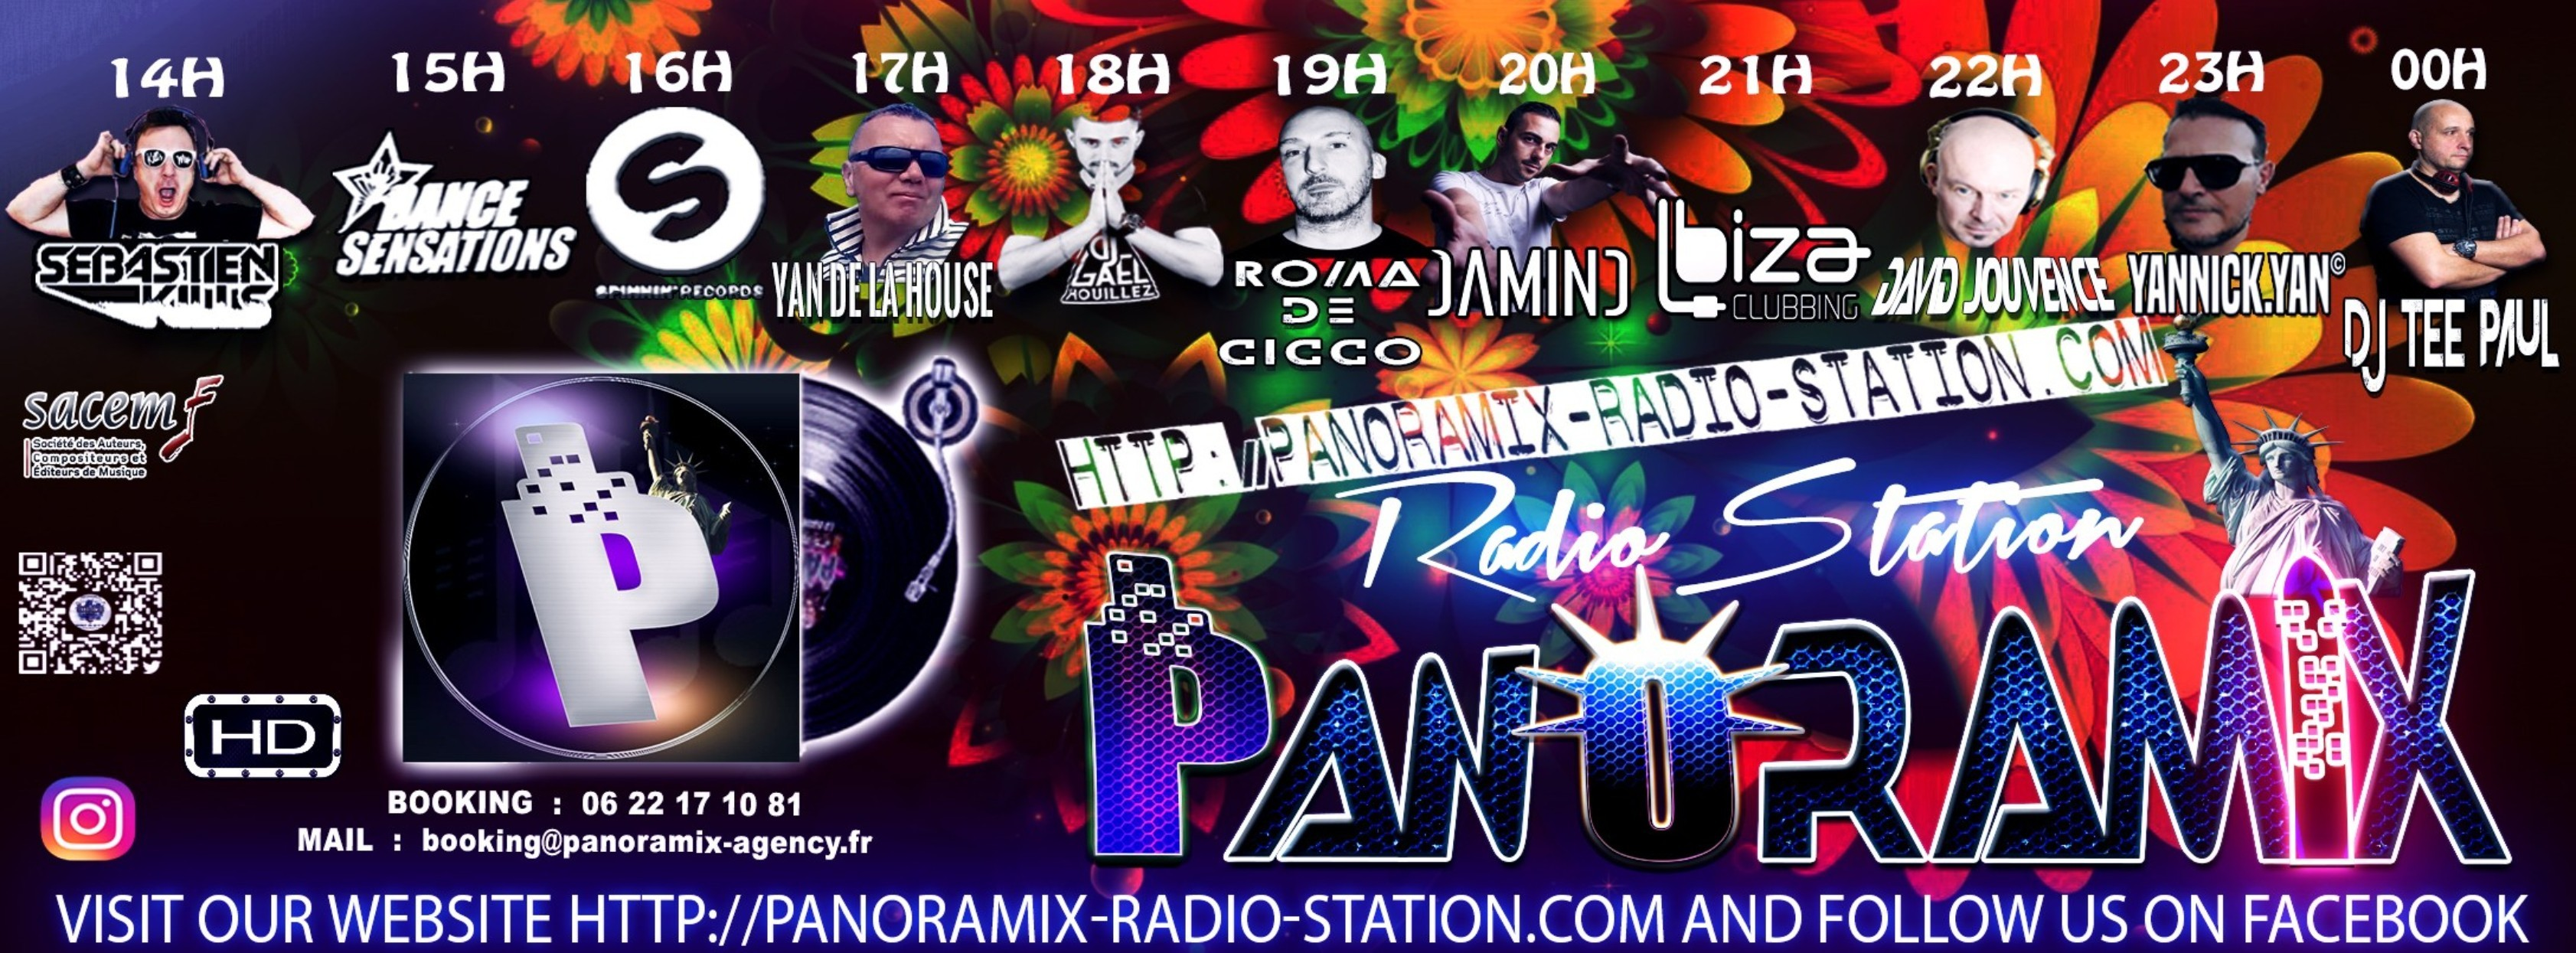 http://panoramix-radio-station.com/wp-content/uploads/2018/07/4948990127561681610_o.jpg